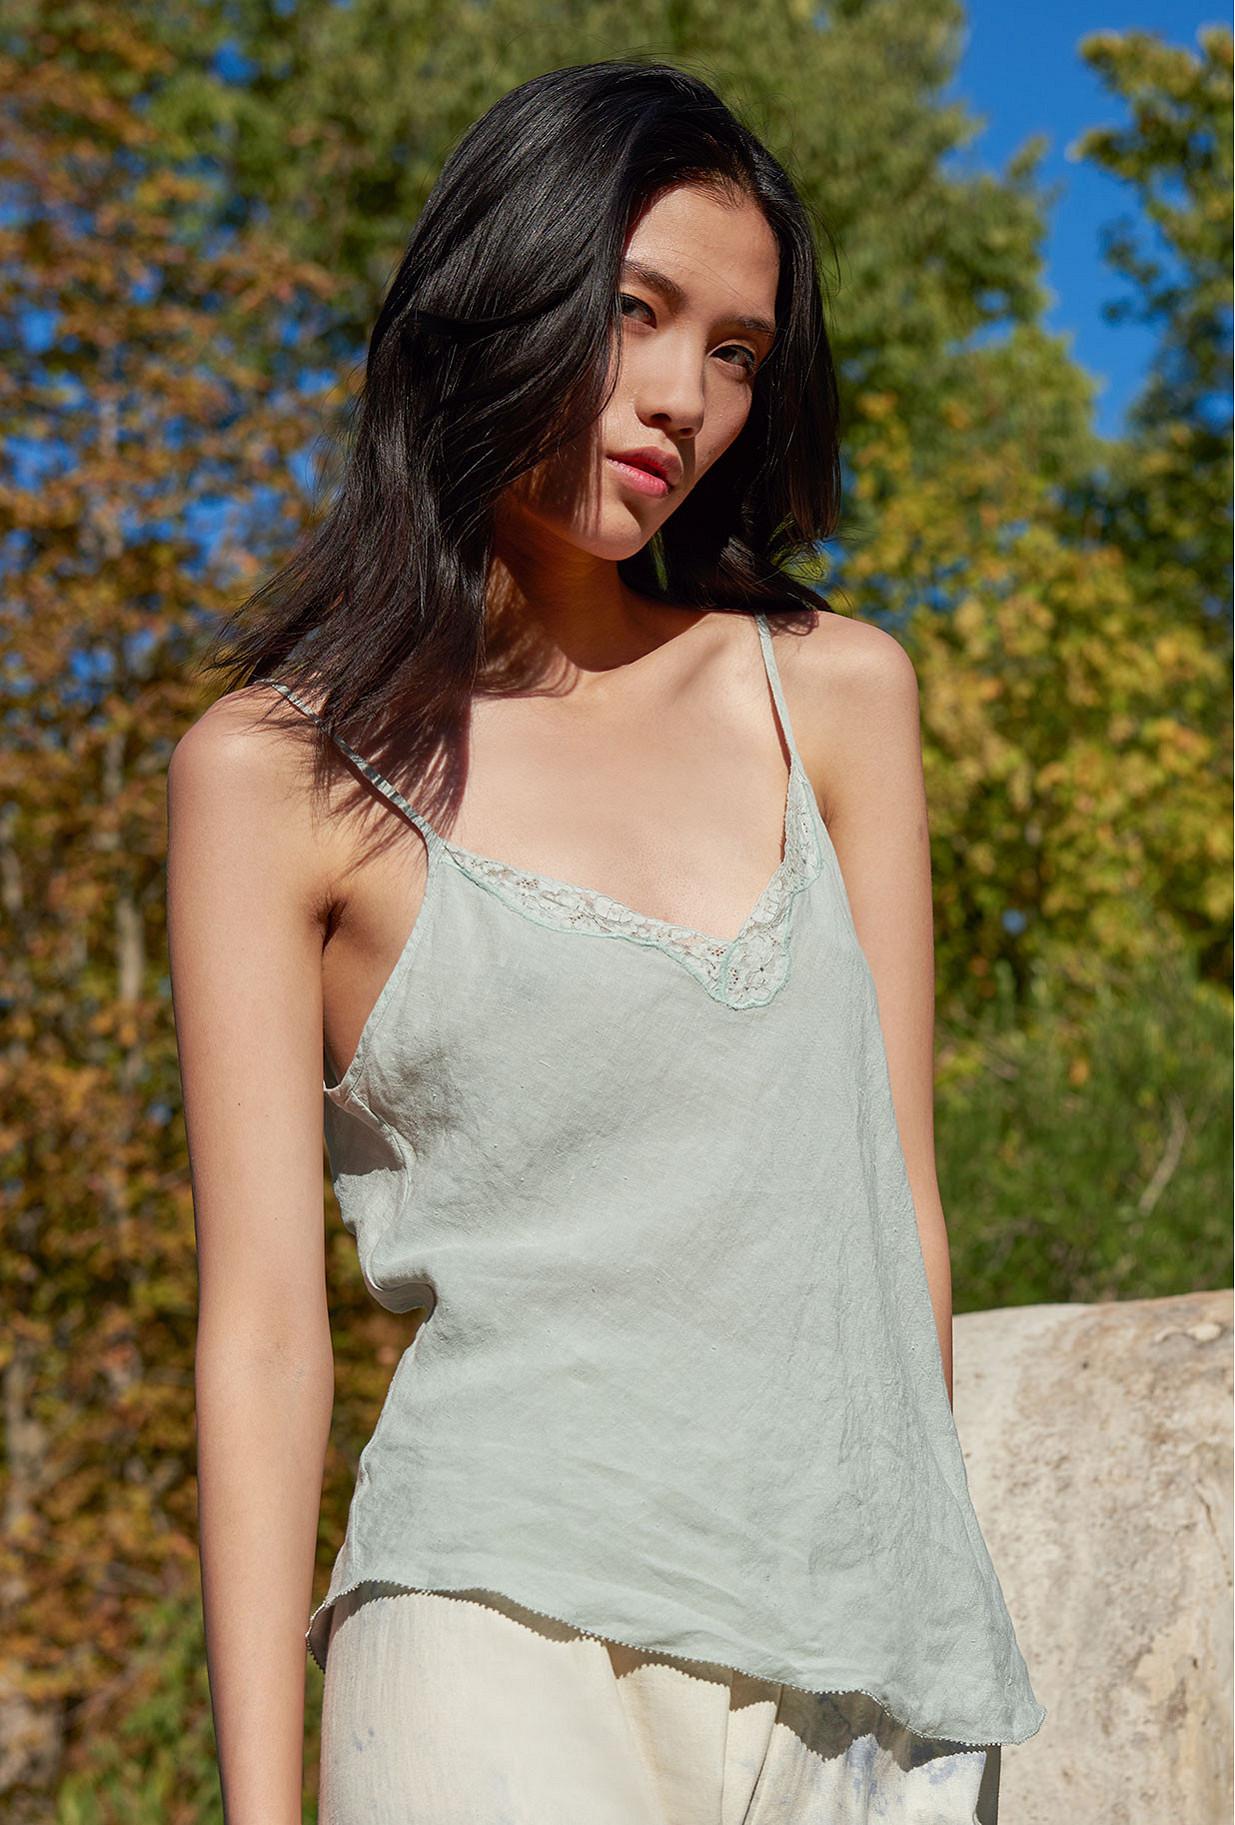 Aqua  Top  Praslin Mes demoiselles fashion clothes designer Paris